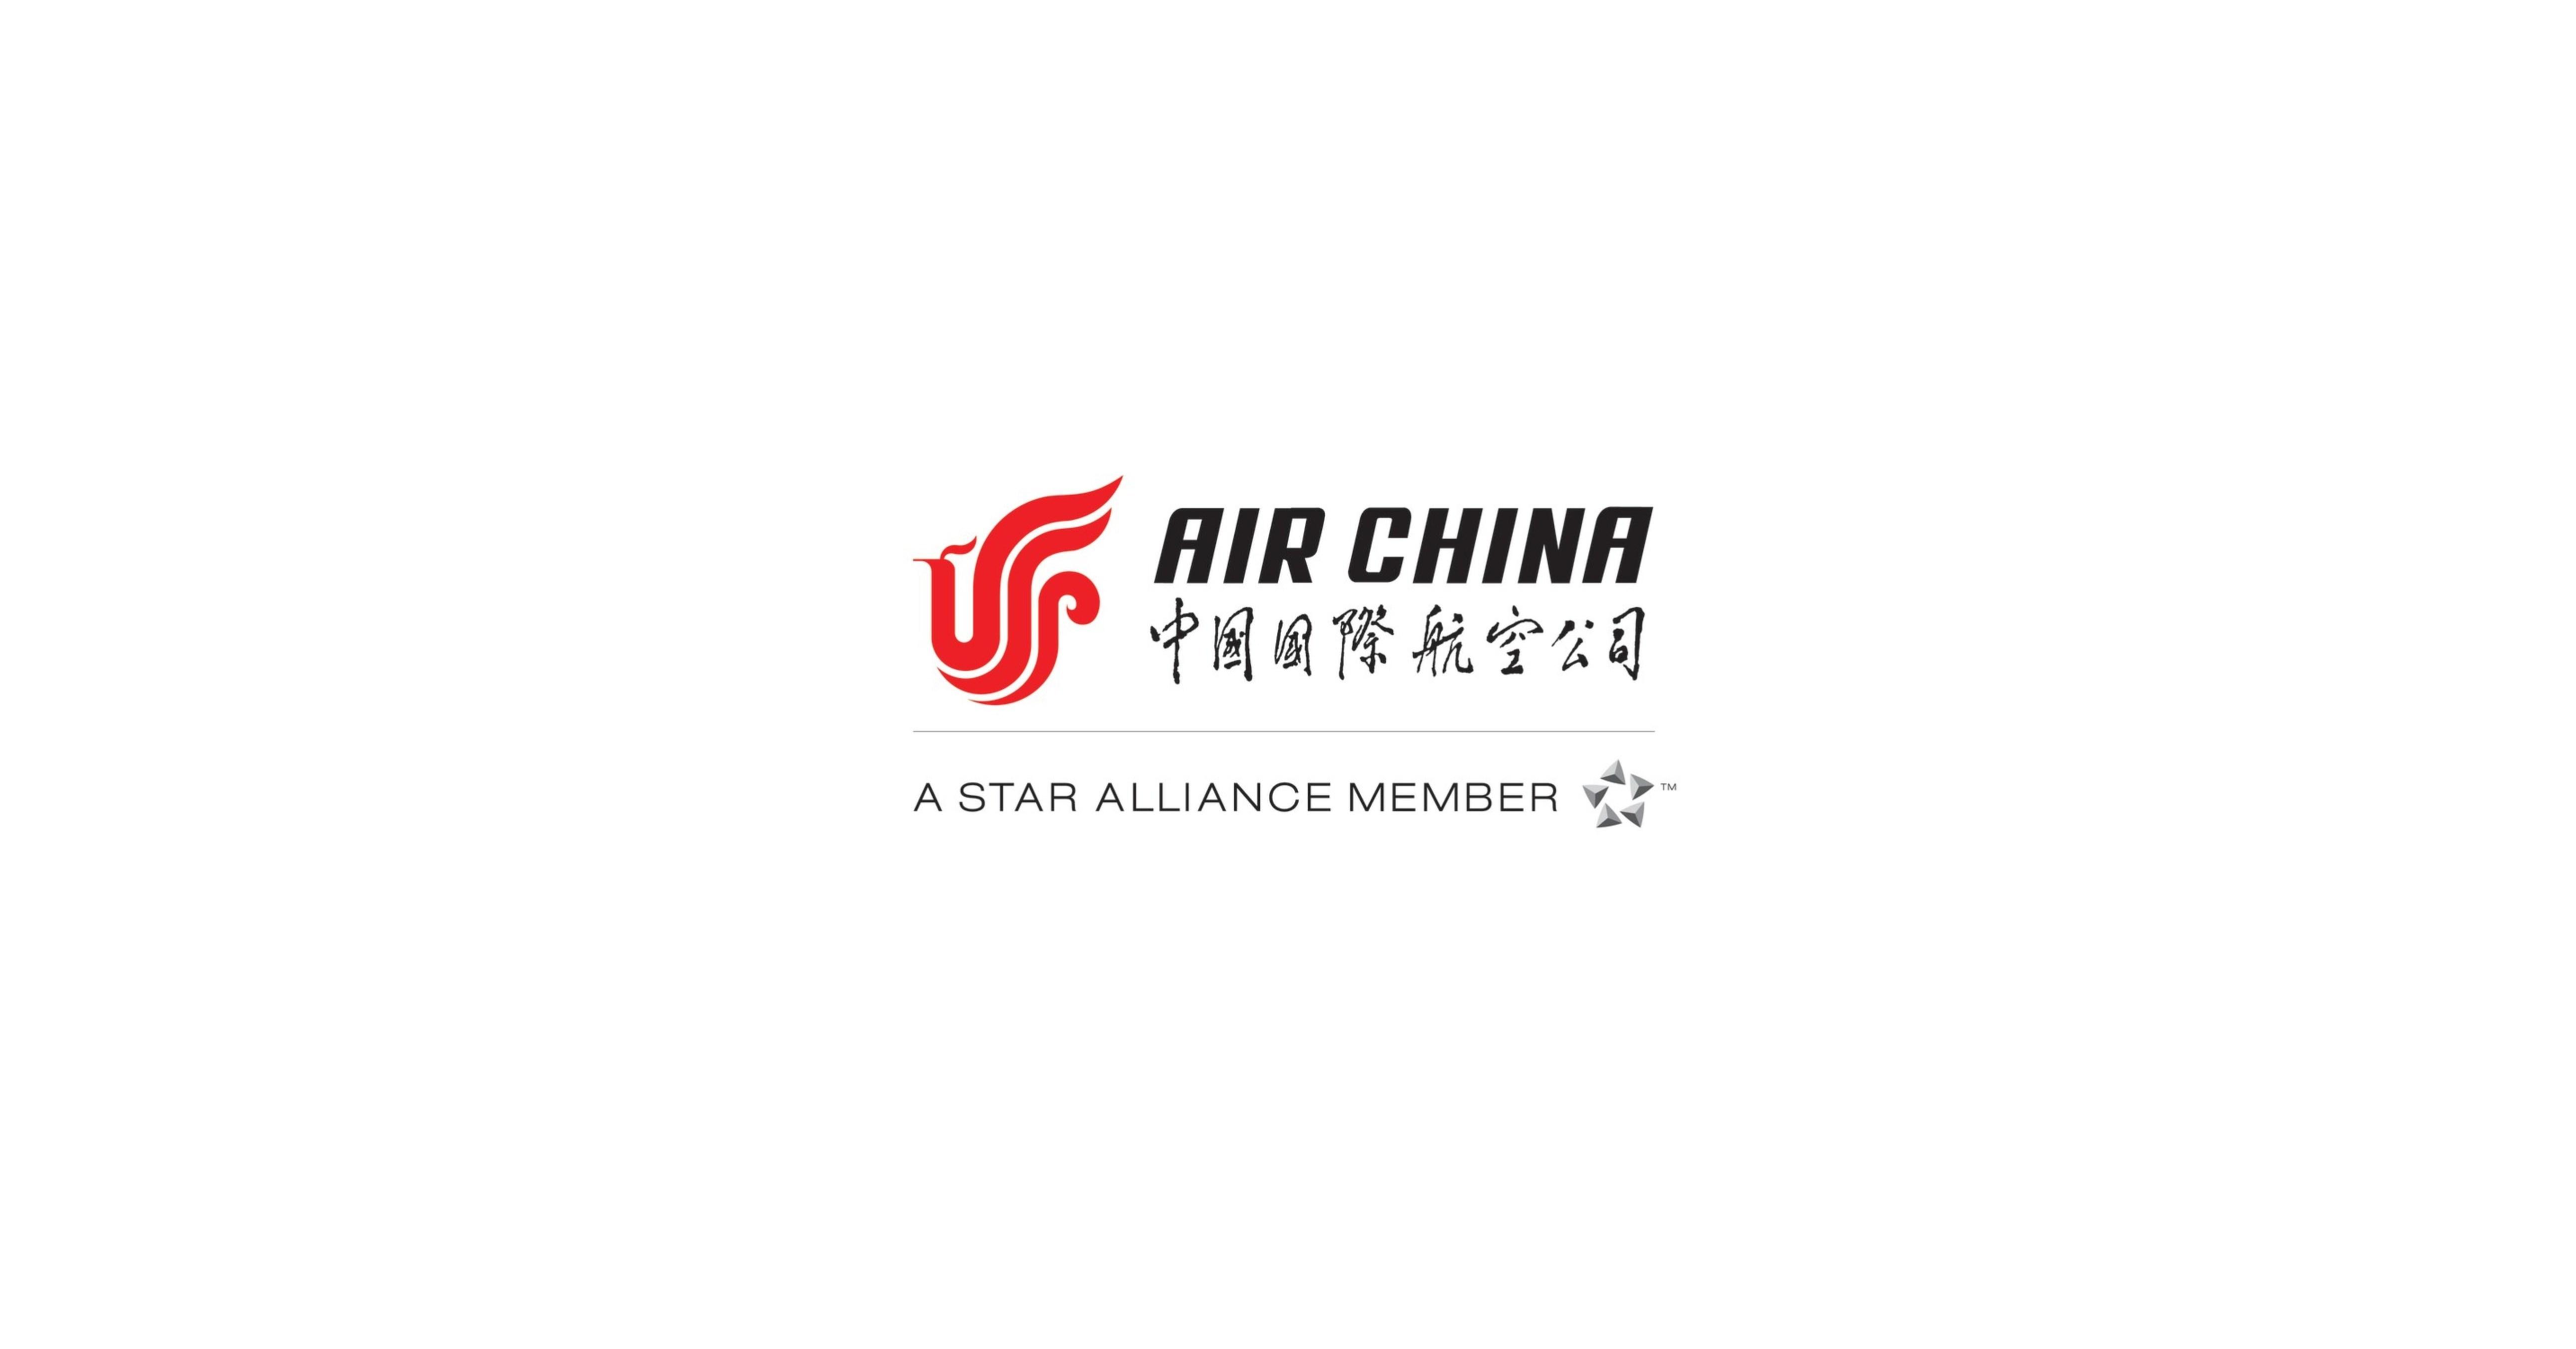 Air China Limited Maakt Tussentijdse Resultaten 2018 Bekend, Blijft op Hoogste Winstniveau